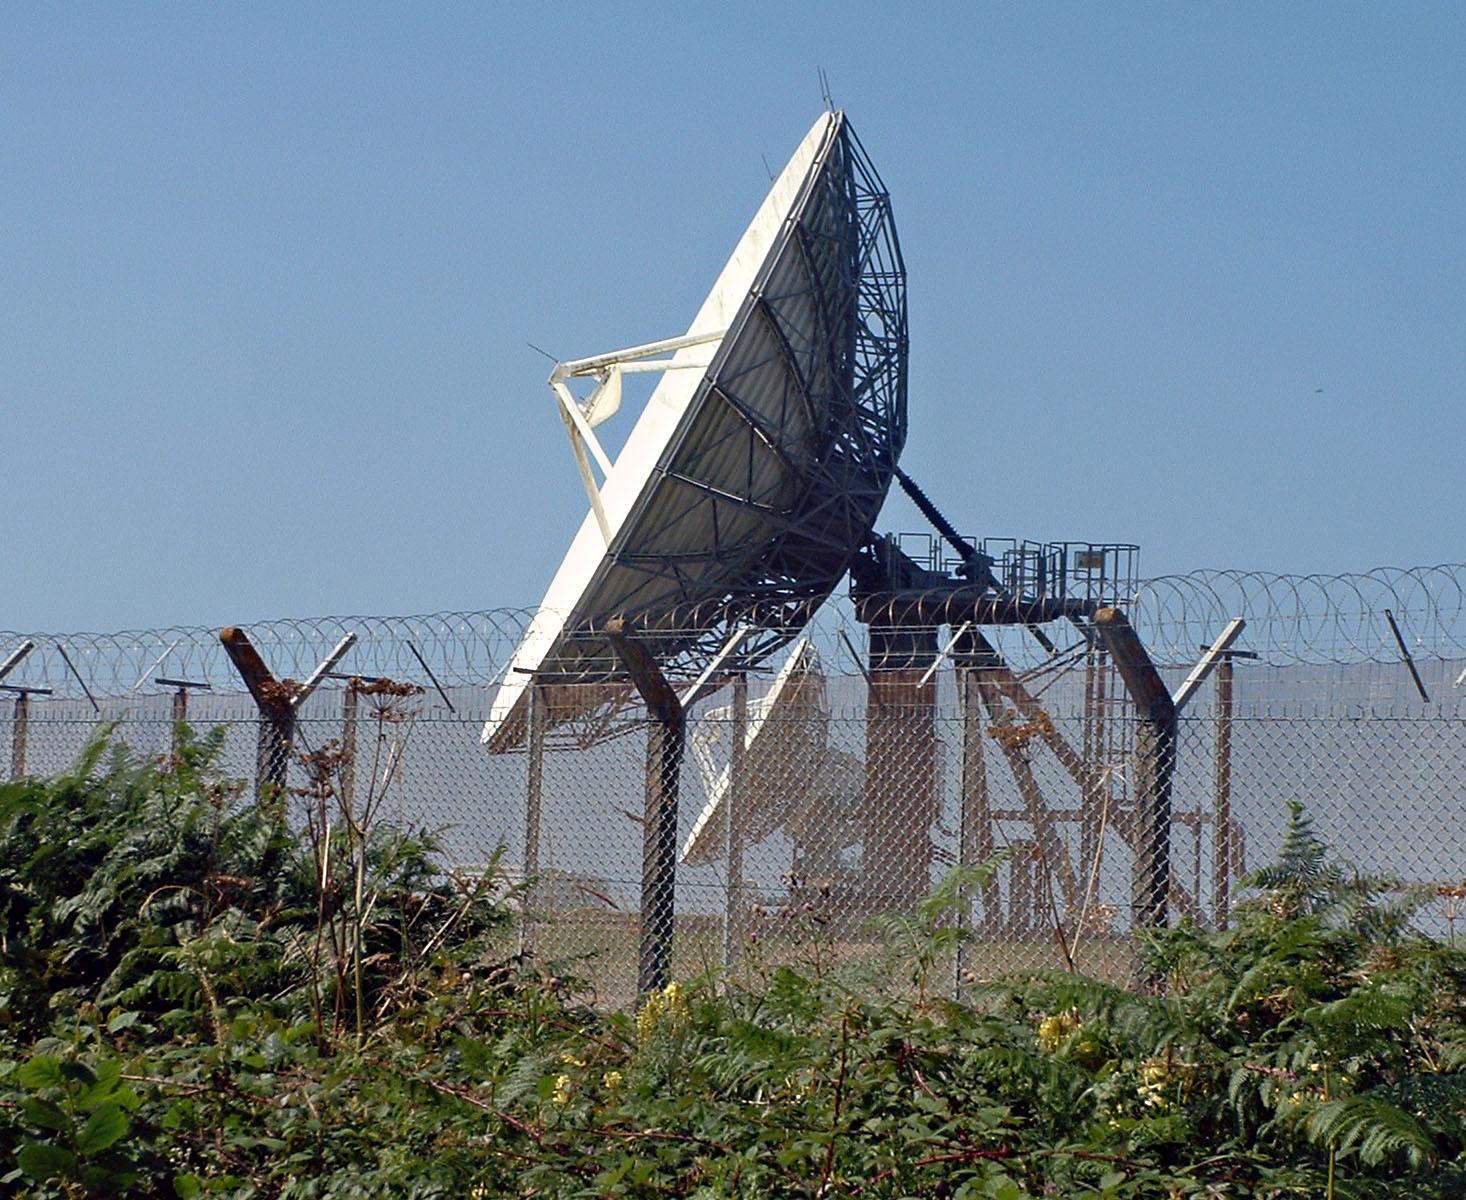 Satelite activity at GCHQ